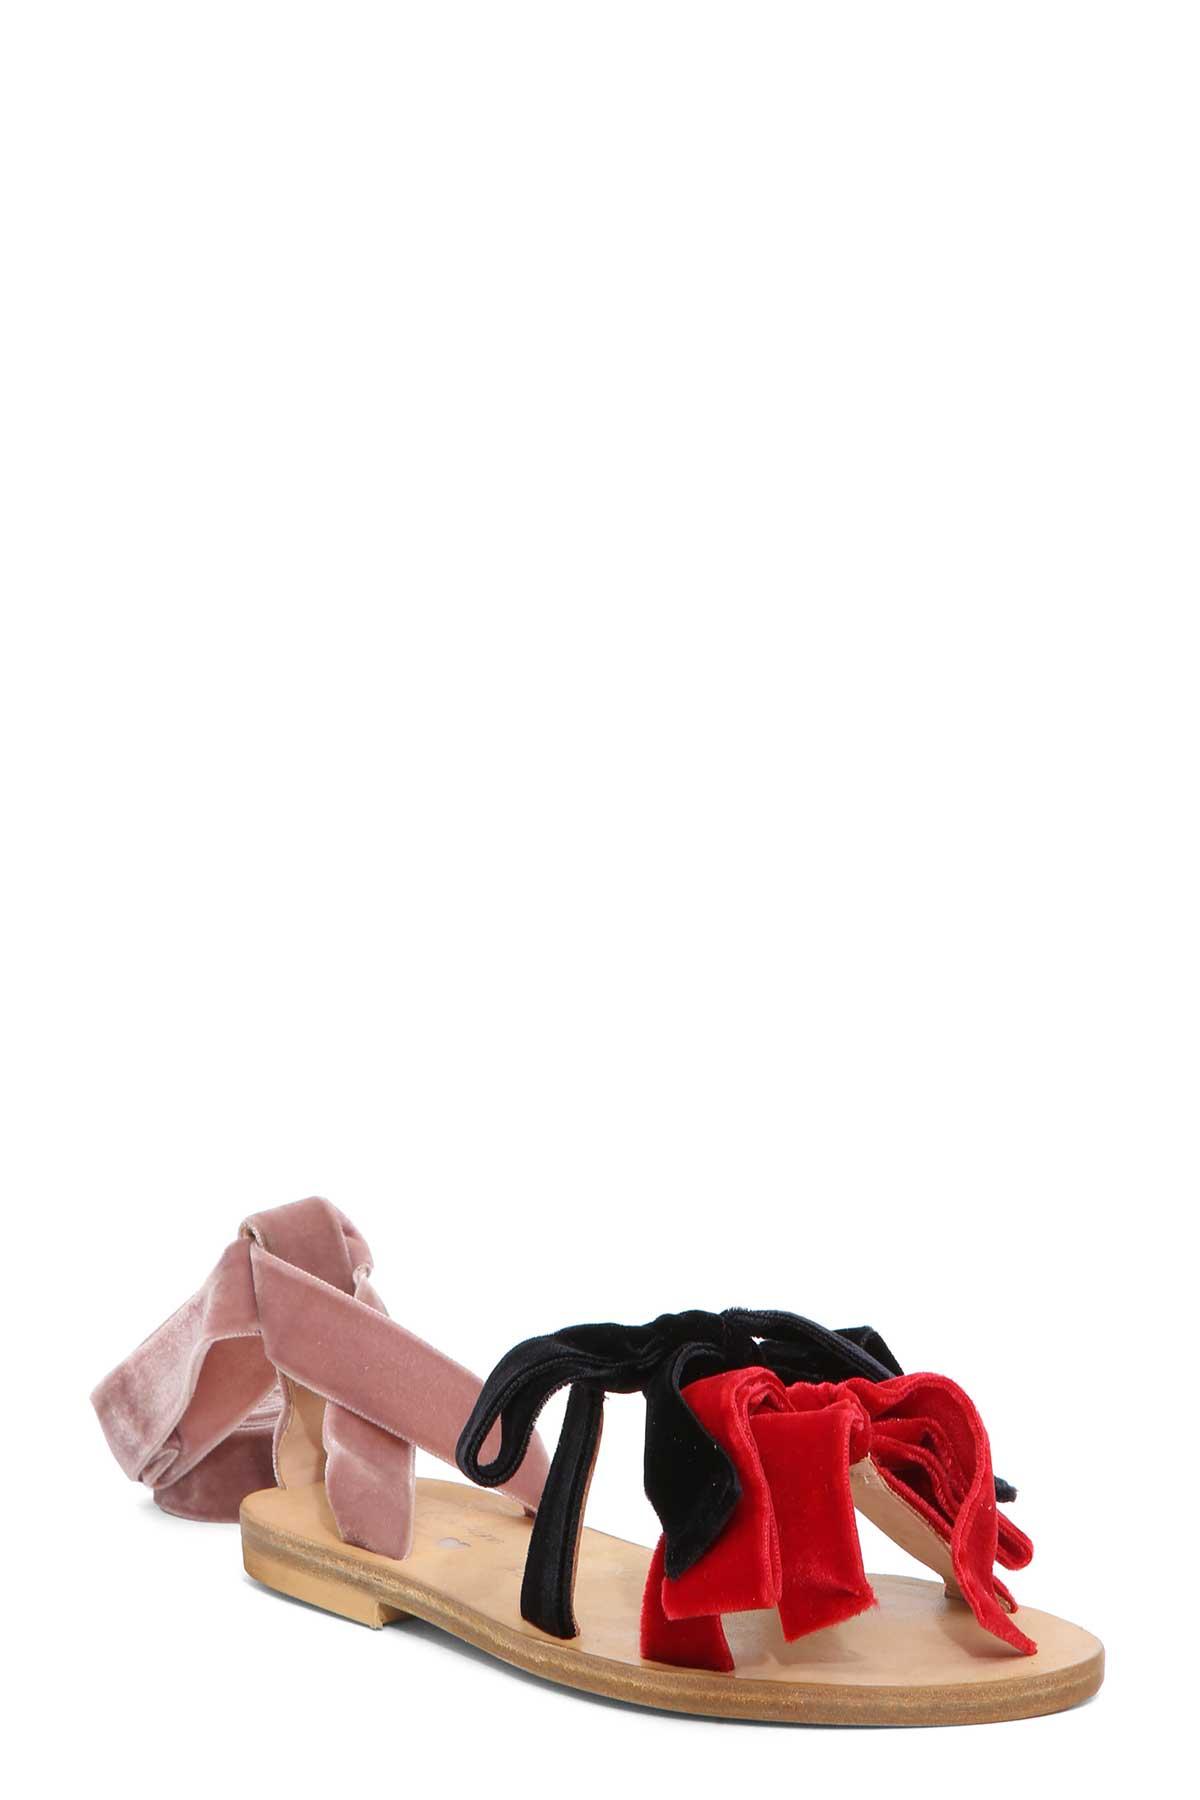 Velvet sandals Gia Couture SV1pVO